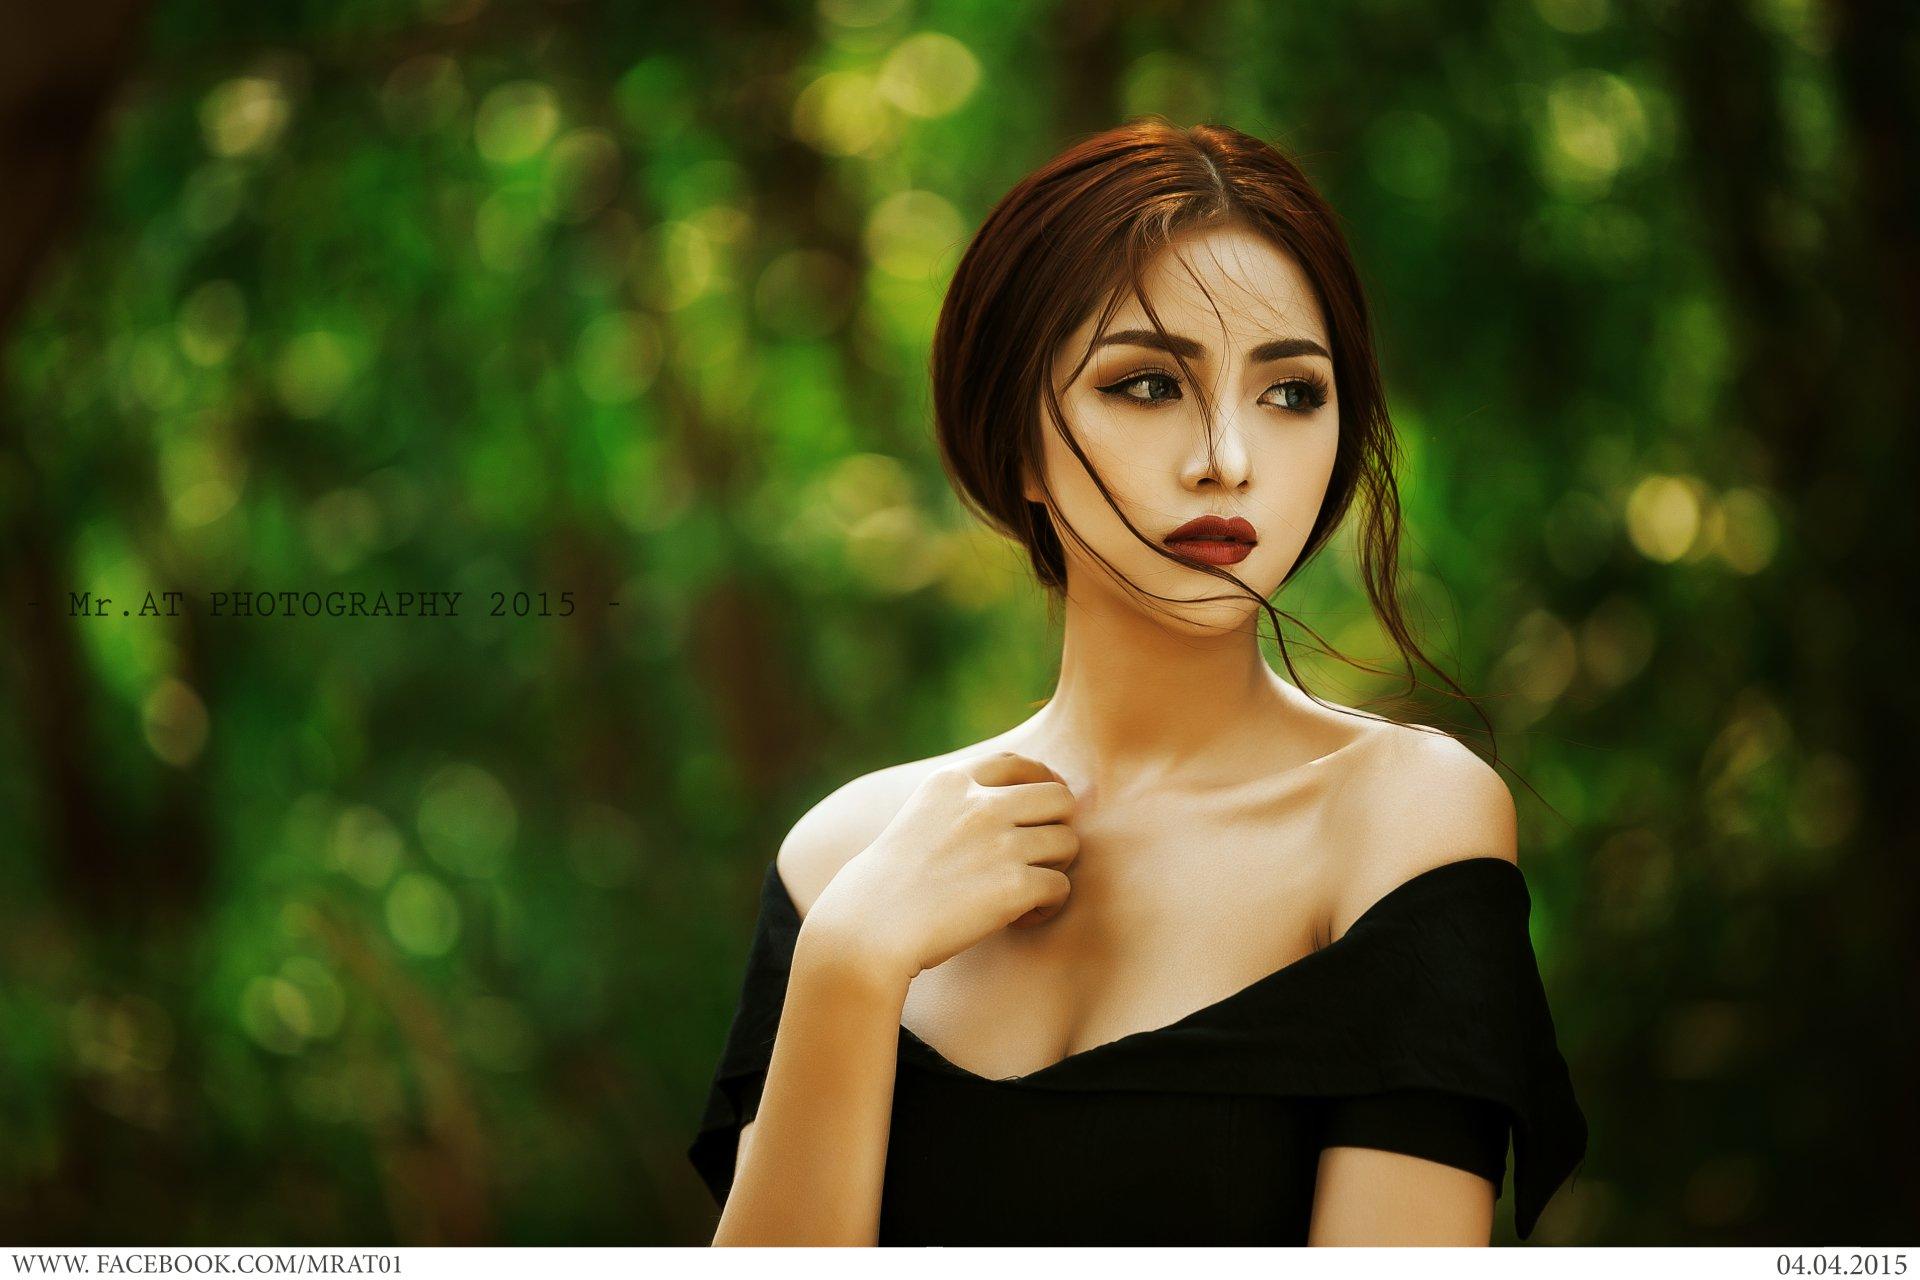 Mai nh quy n hd wallpaper background image 3816x2544 - Asian girl 4k ...